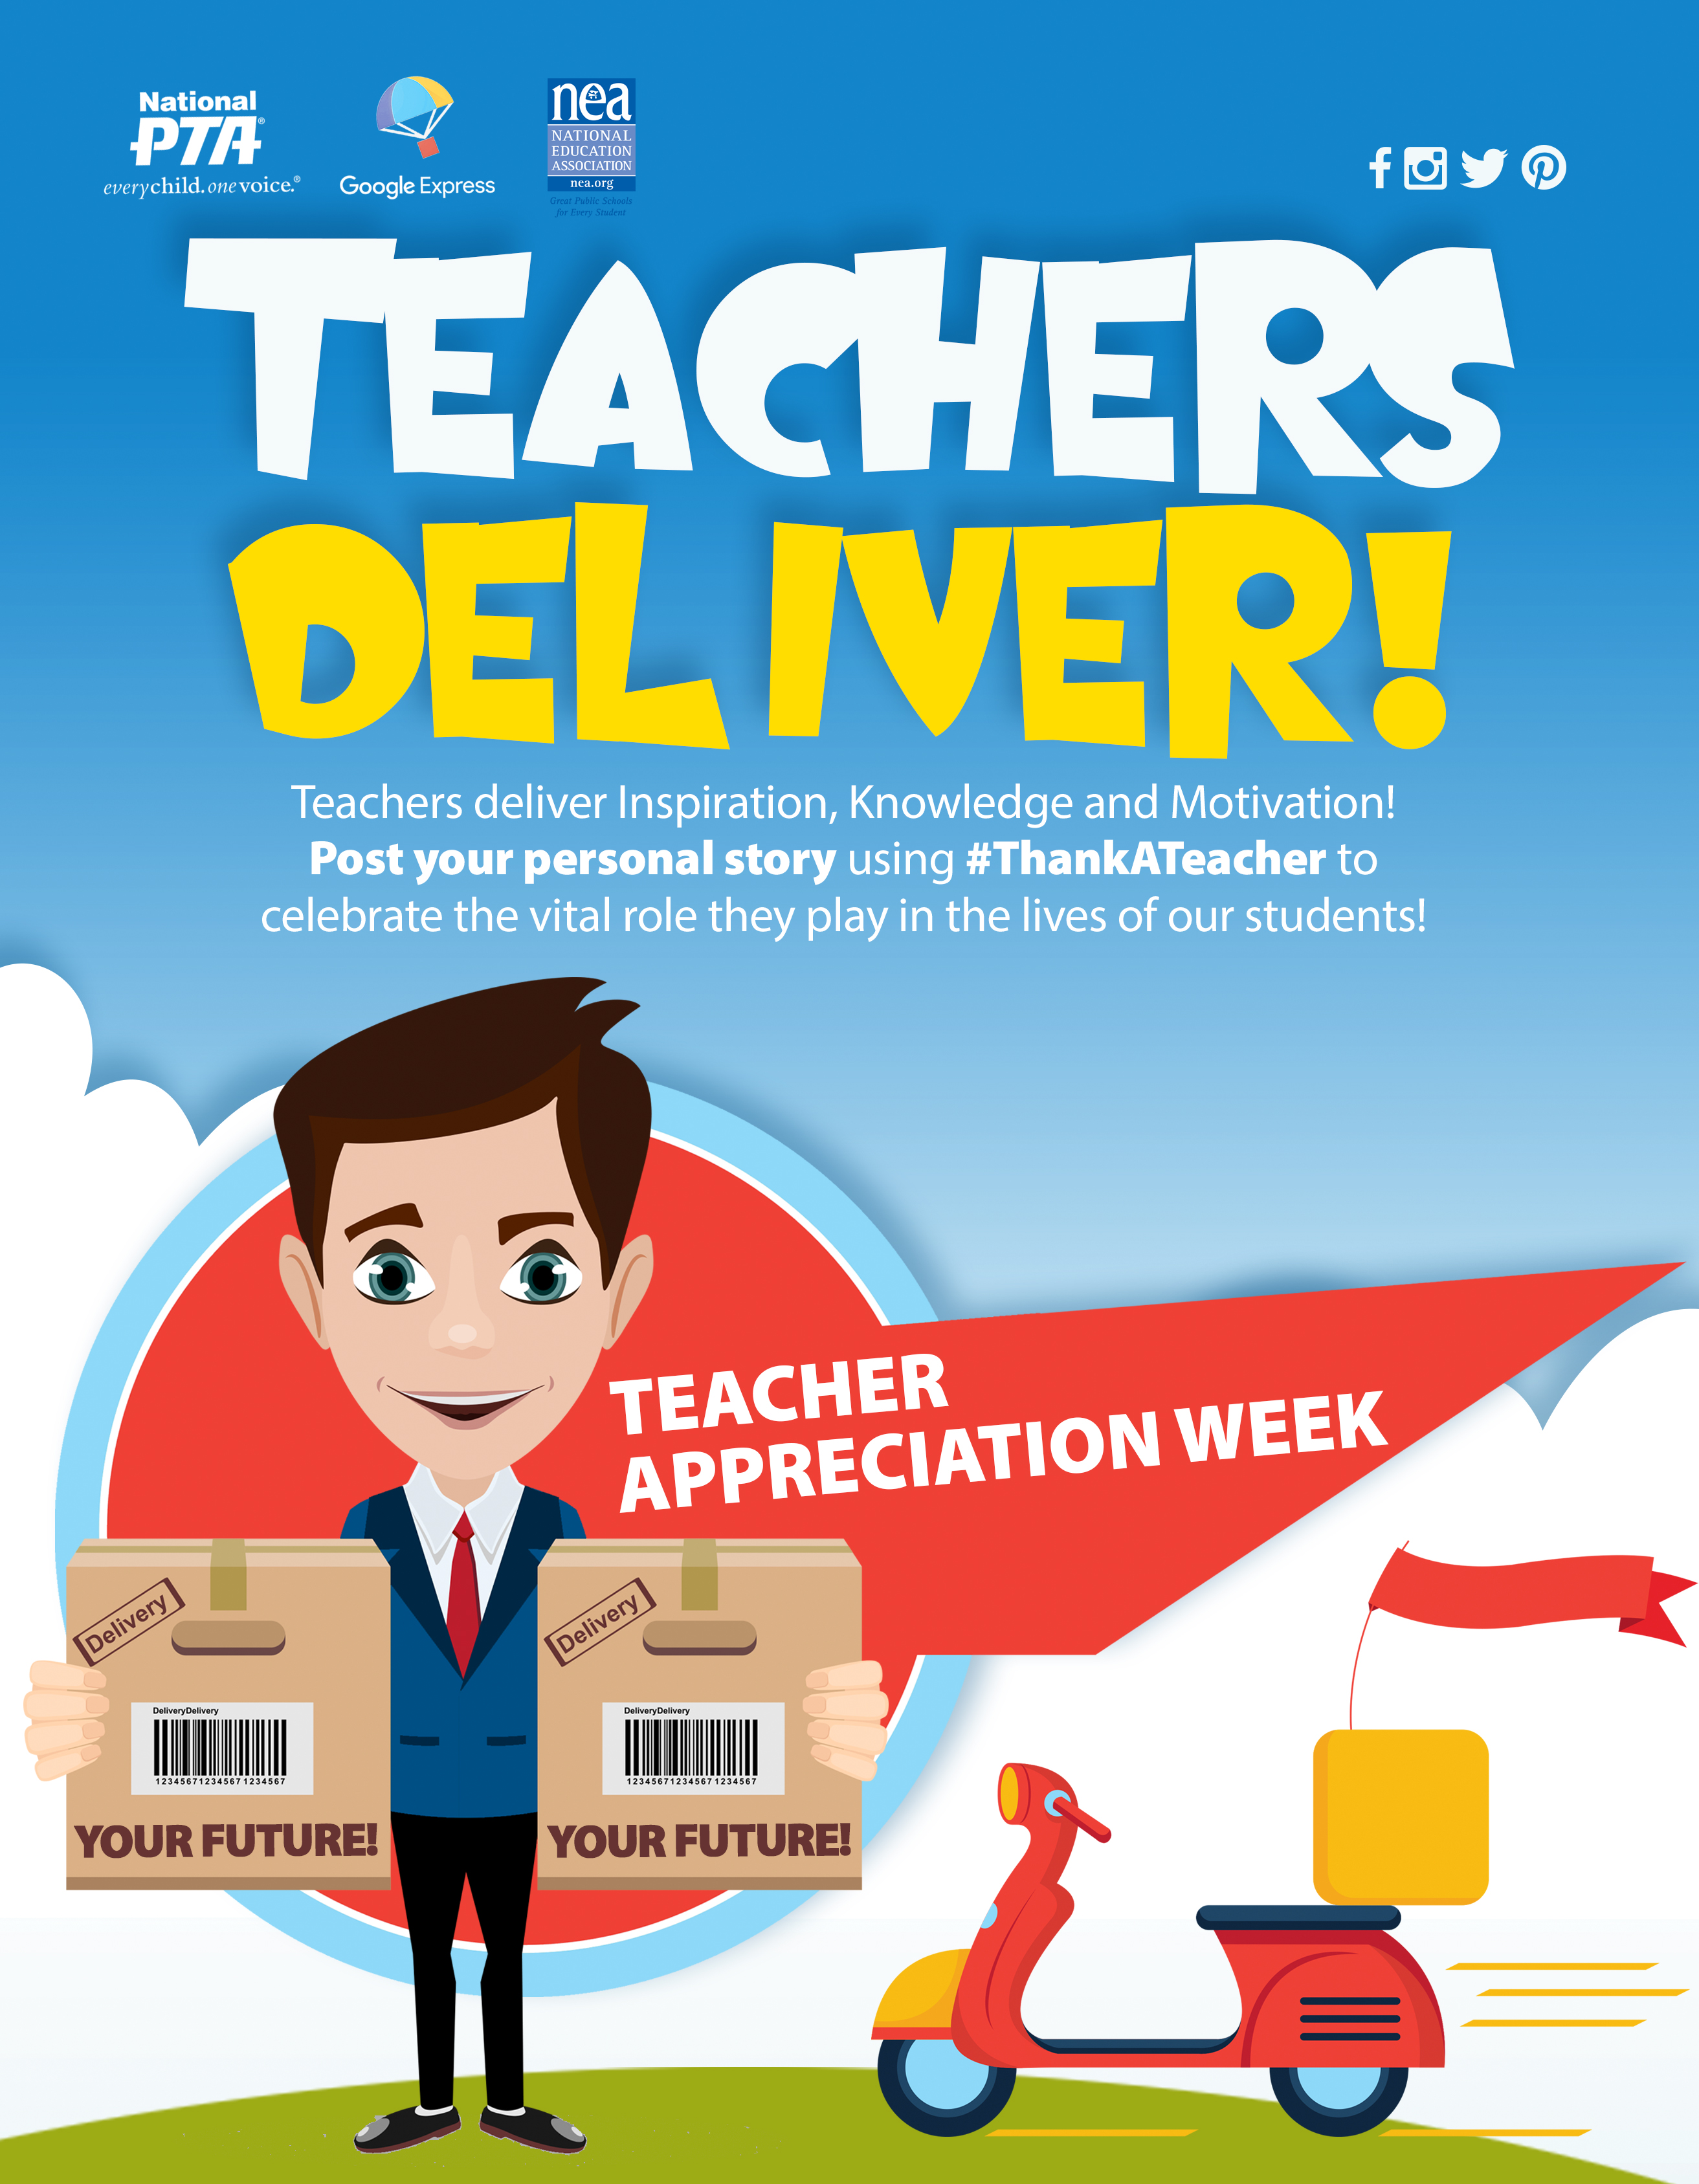 Teacher Appreciation Week 2017 Flyer: Event Toolkit—Teacher Appreciation Week   Programs   National PTA,